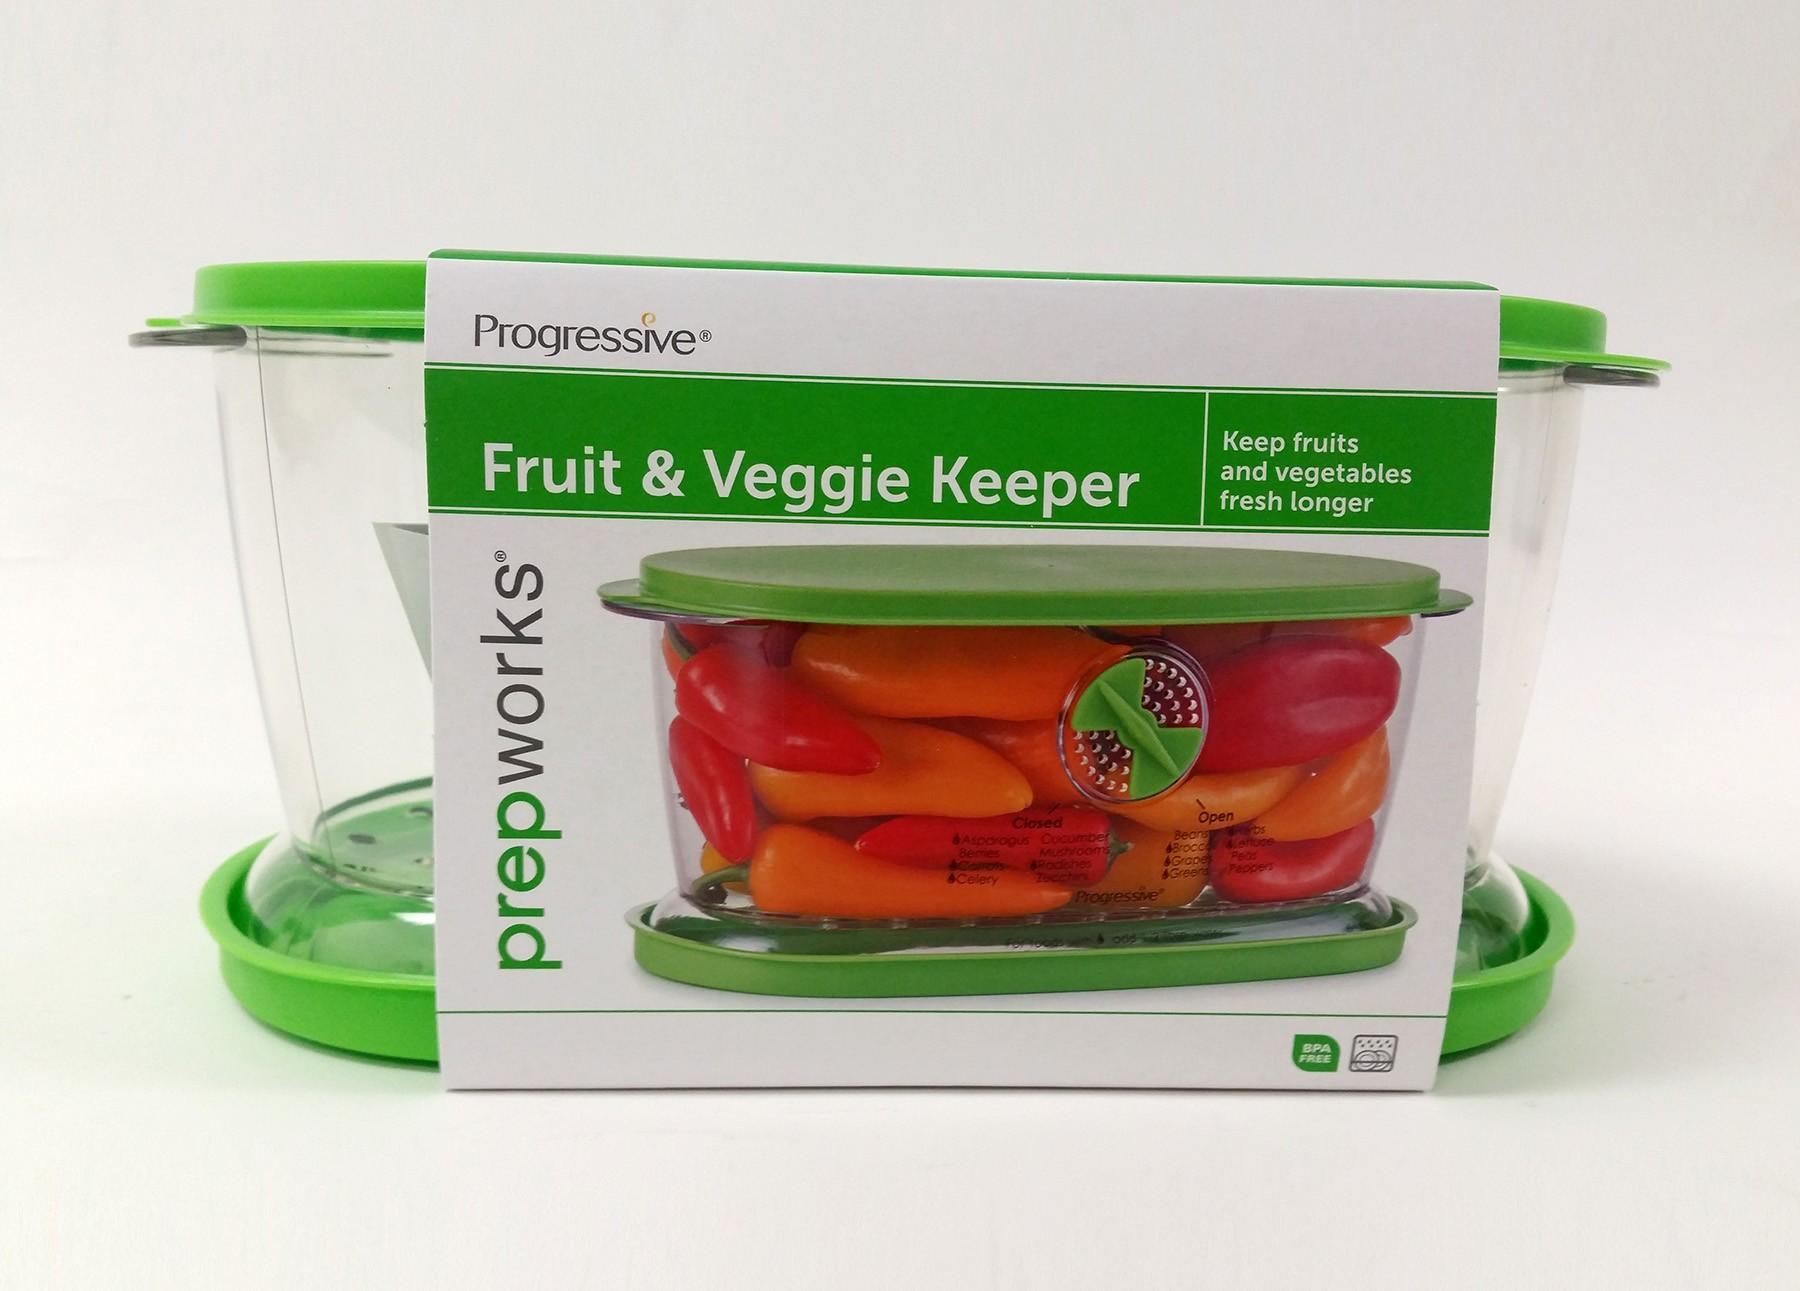 Fruit & Veggie Keeper